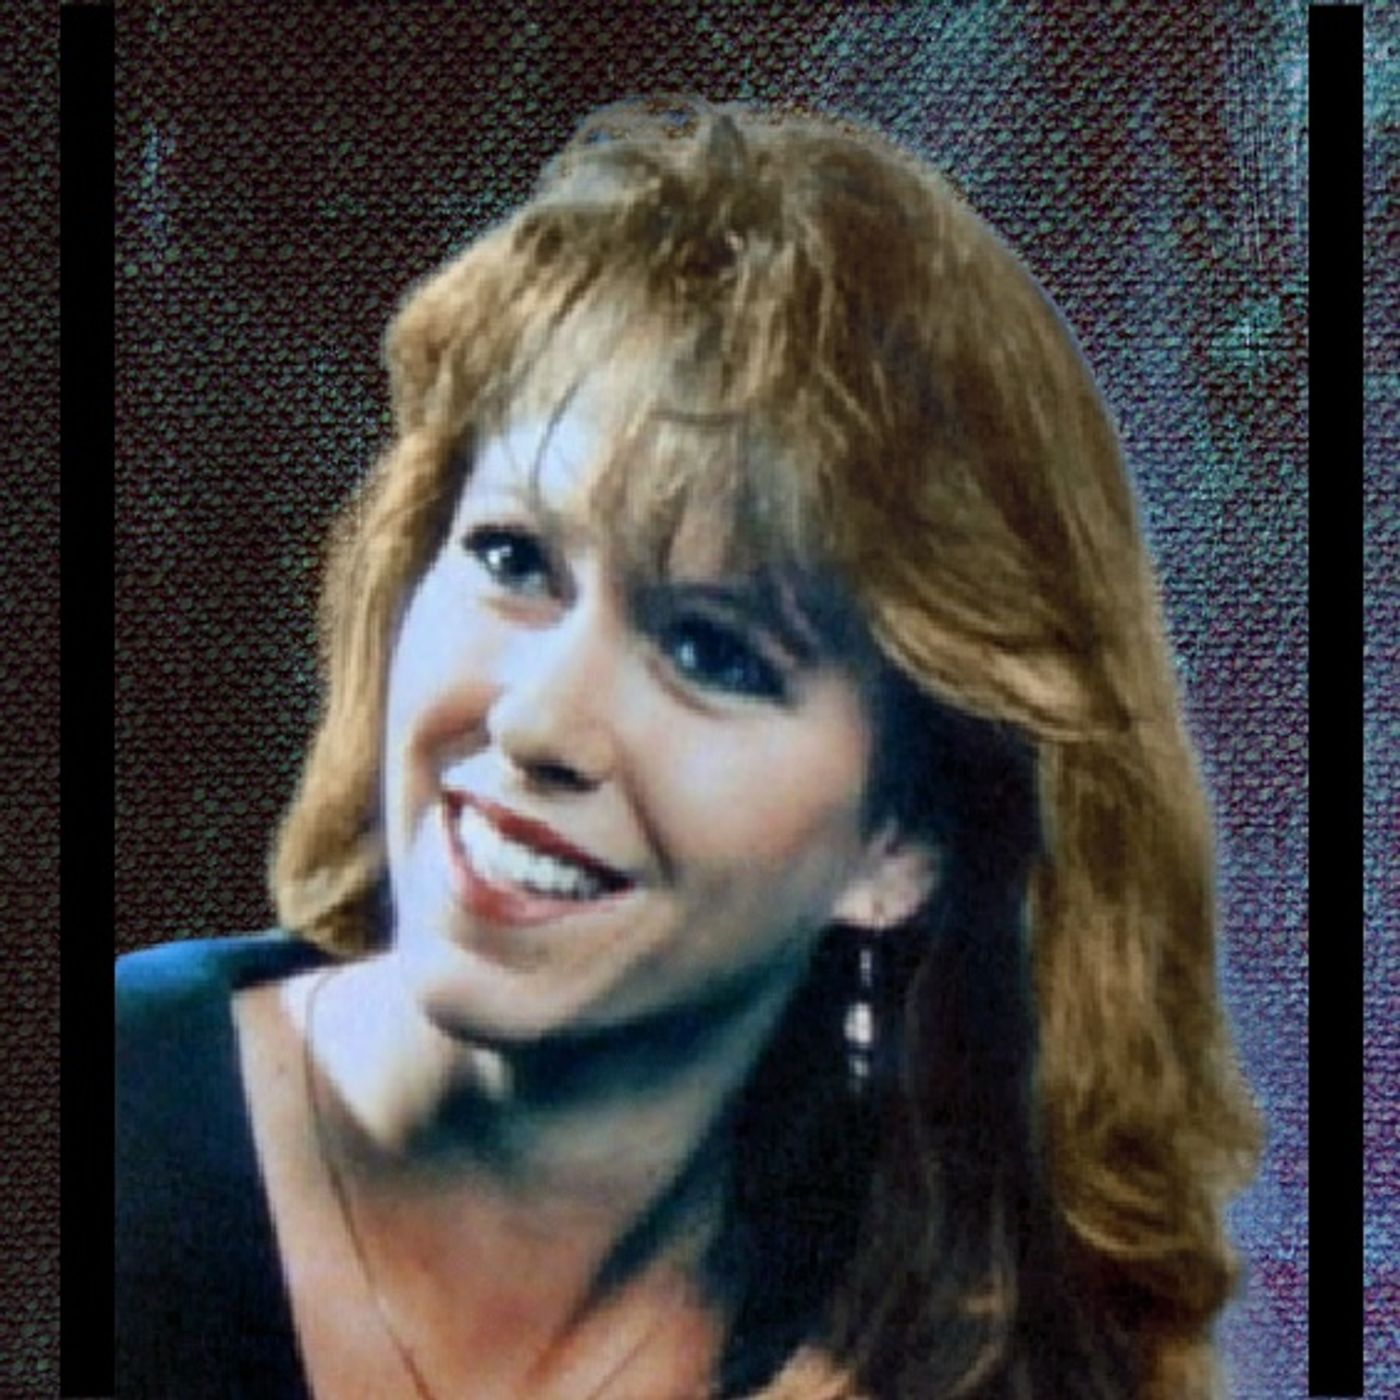 No Trace: The Disappearance of Tara Breckenridge